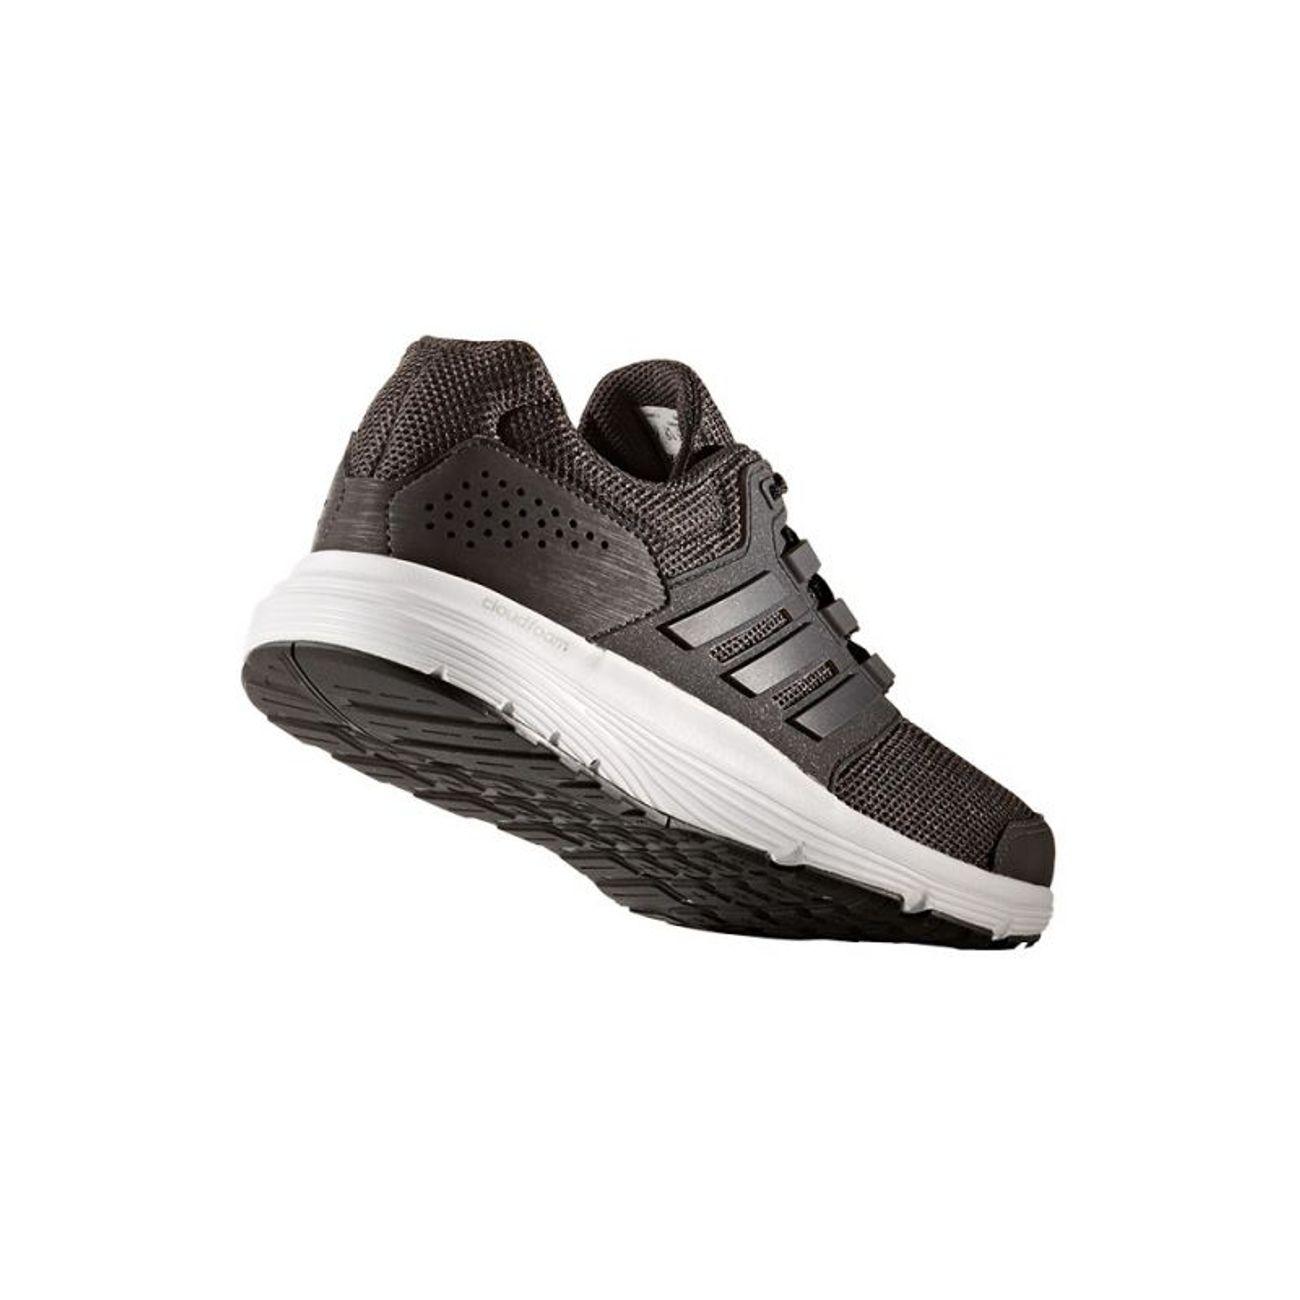 best service ba8a5 ea8ad ... Course à pied femme ADIDAS PERFORMANCE Adidas Performance Galaxy 4  noir, chaussures de running femme ...